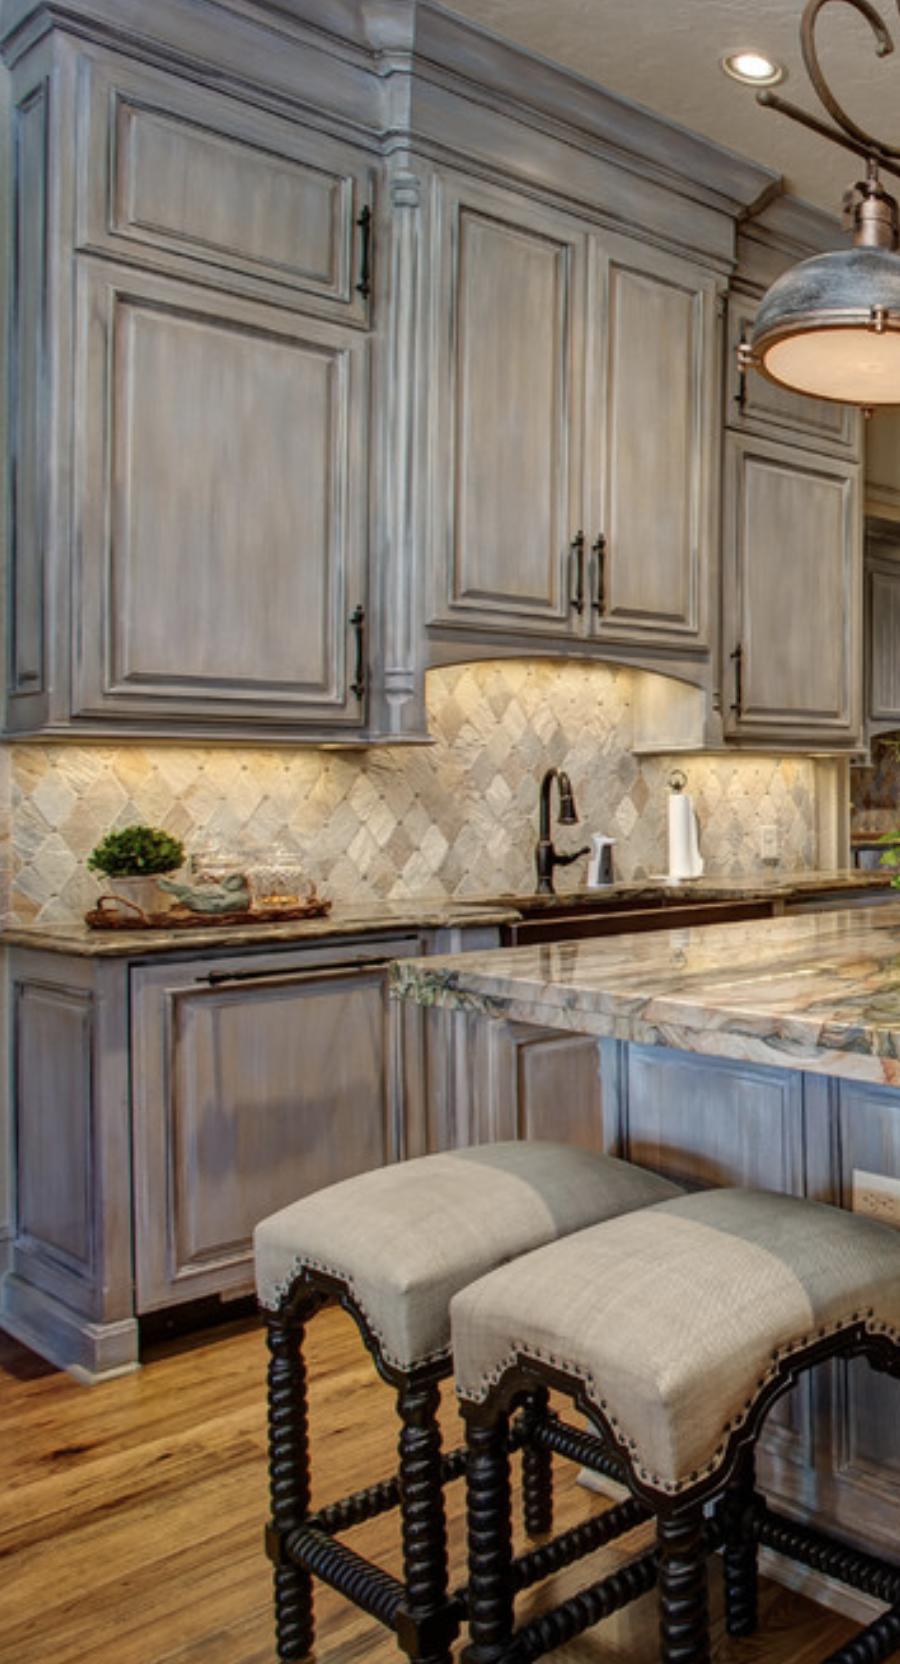 gray kitchen cabinetry beautiful kitchens kitchen kitchen cabinetry on kitchen decor grey cabinets id=38387